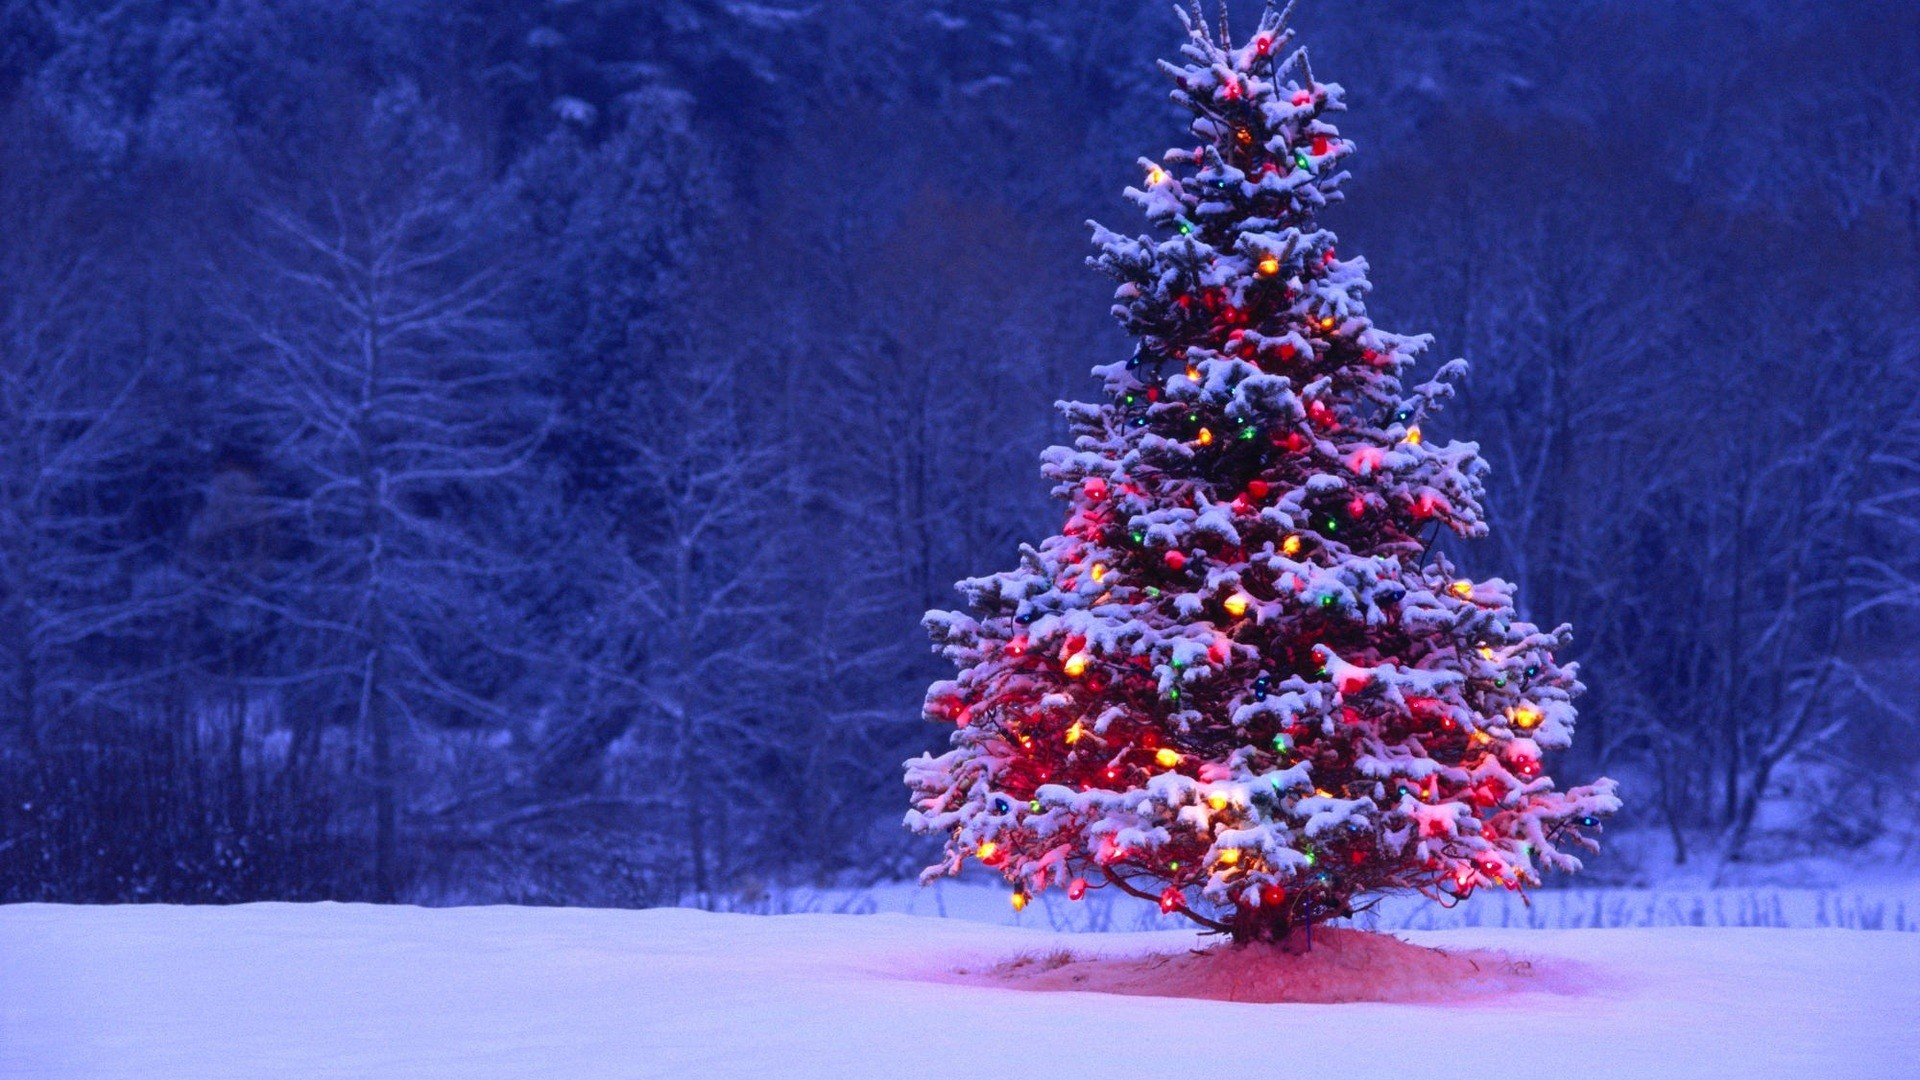 Hd Christmas Desktop Wallpaper Sf Wallpaper